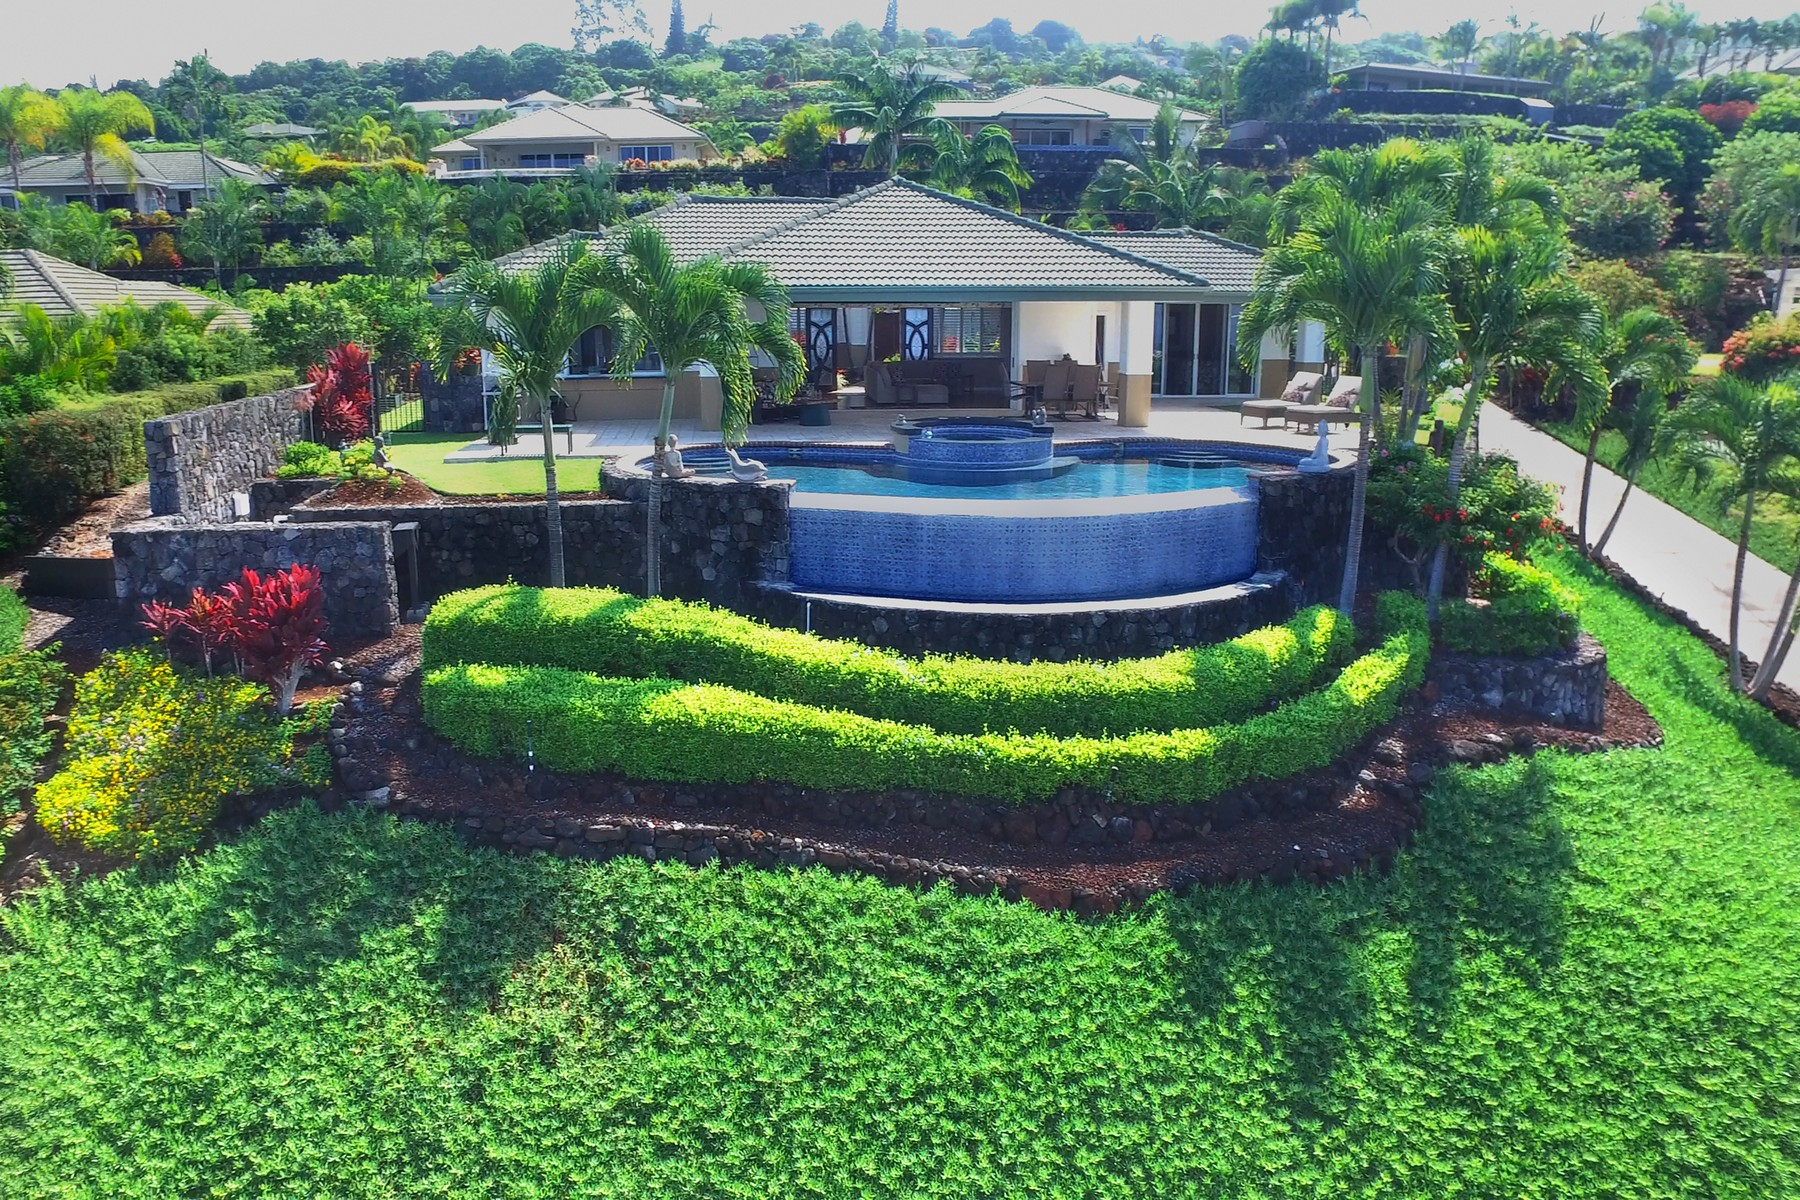 独户住宅 为 销售 在 Iolani Subdivision 78-864 N. Pueo Pl 纳市, 夏威夷, 96740 美国